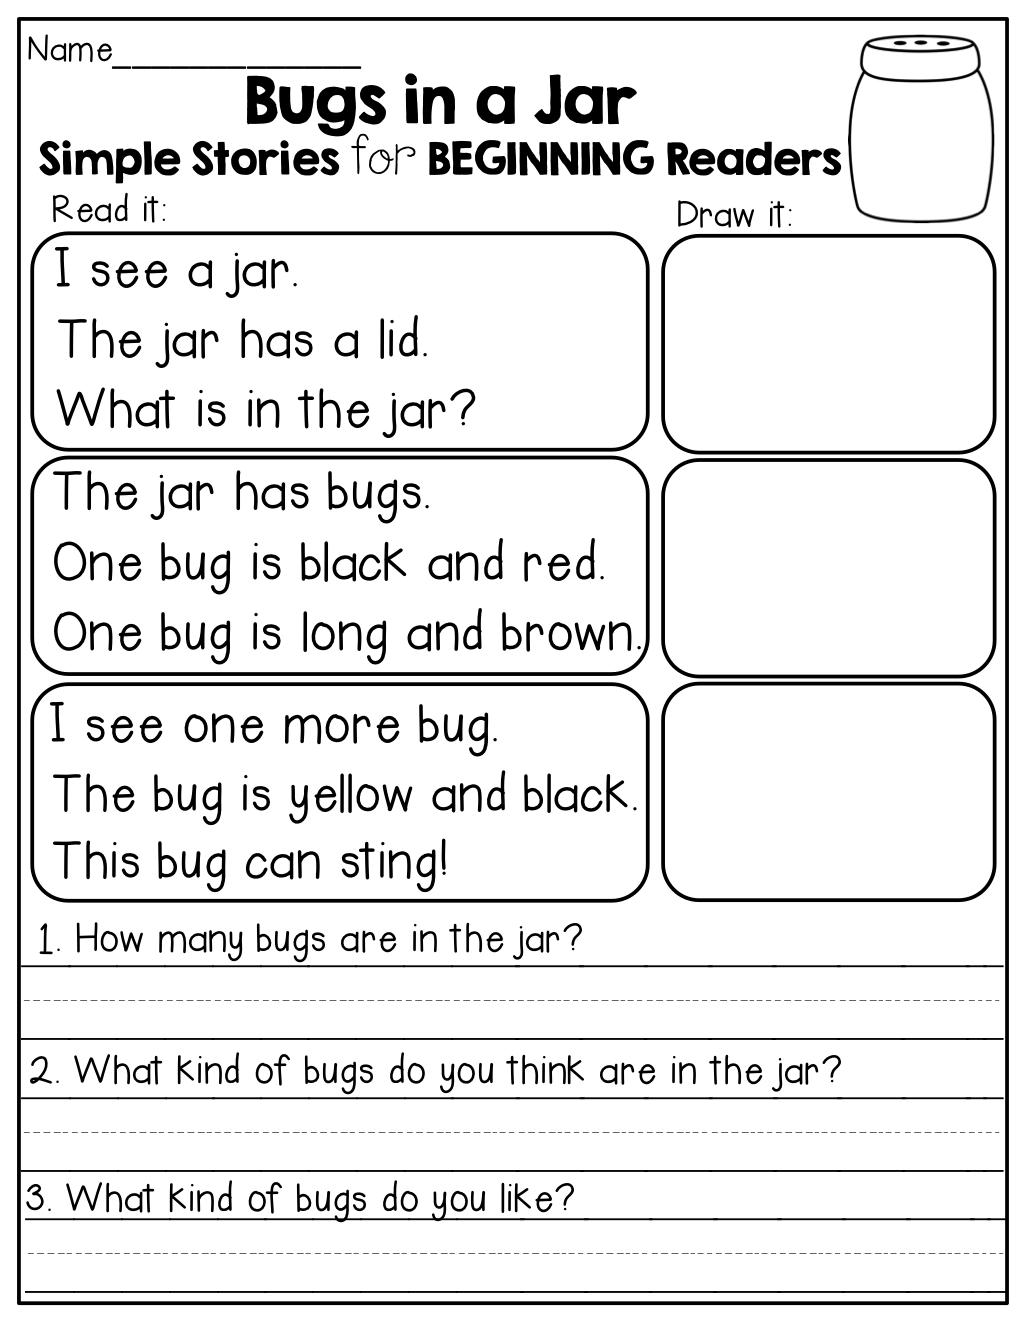 2nd Grade Reading Worksheets Best Coloring Pages For Kids Kindergarten Reading 2nd Grade Reading Worksheets Reading Worksheets [ 1325 x 1024 Pixel ]